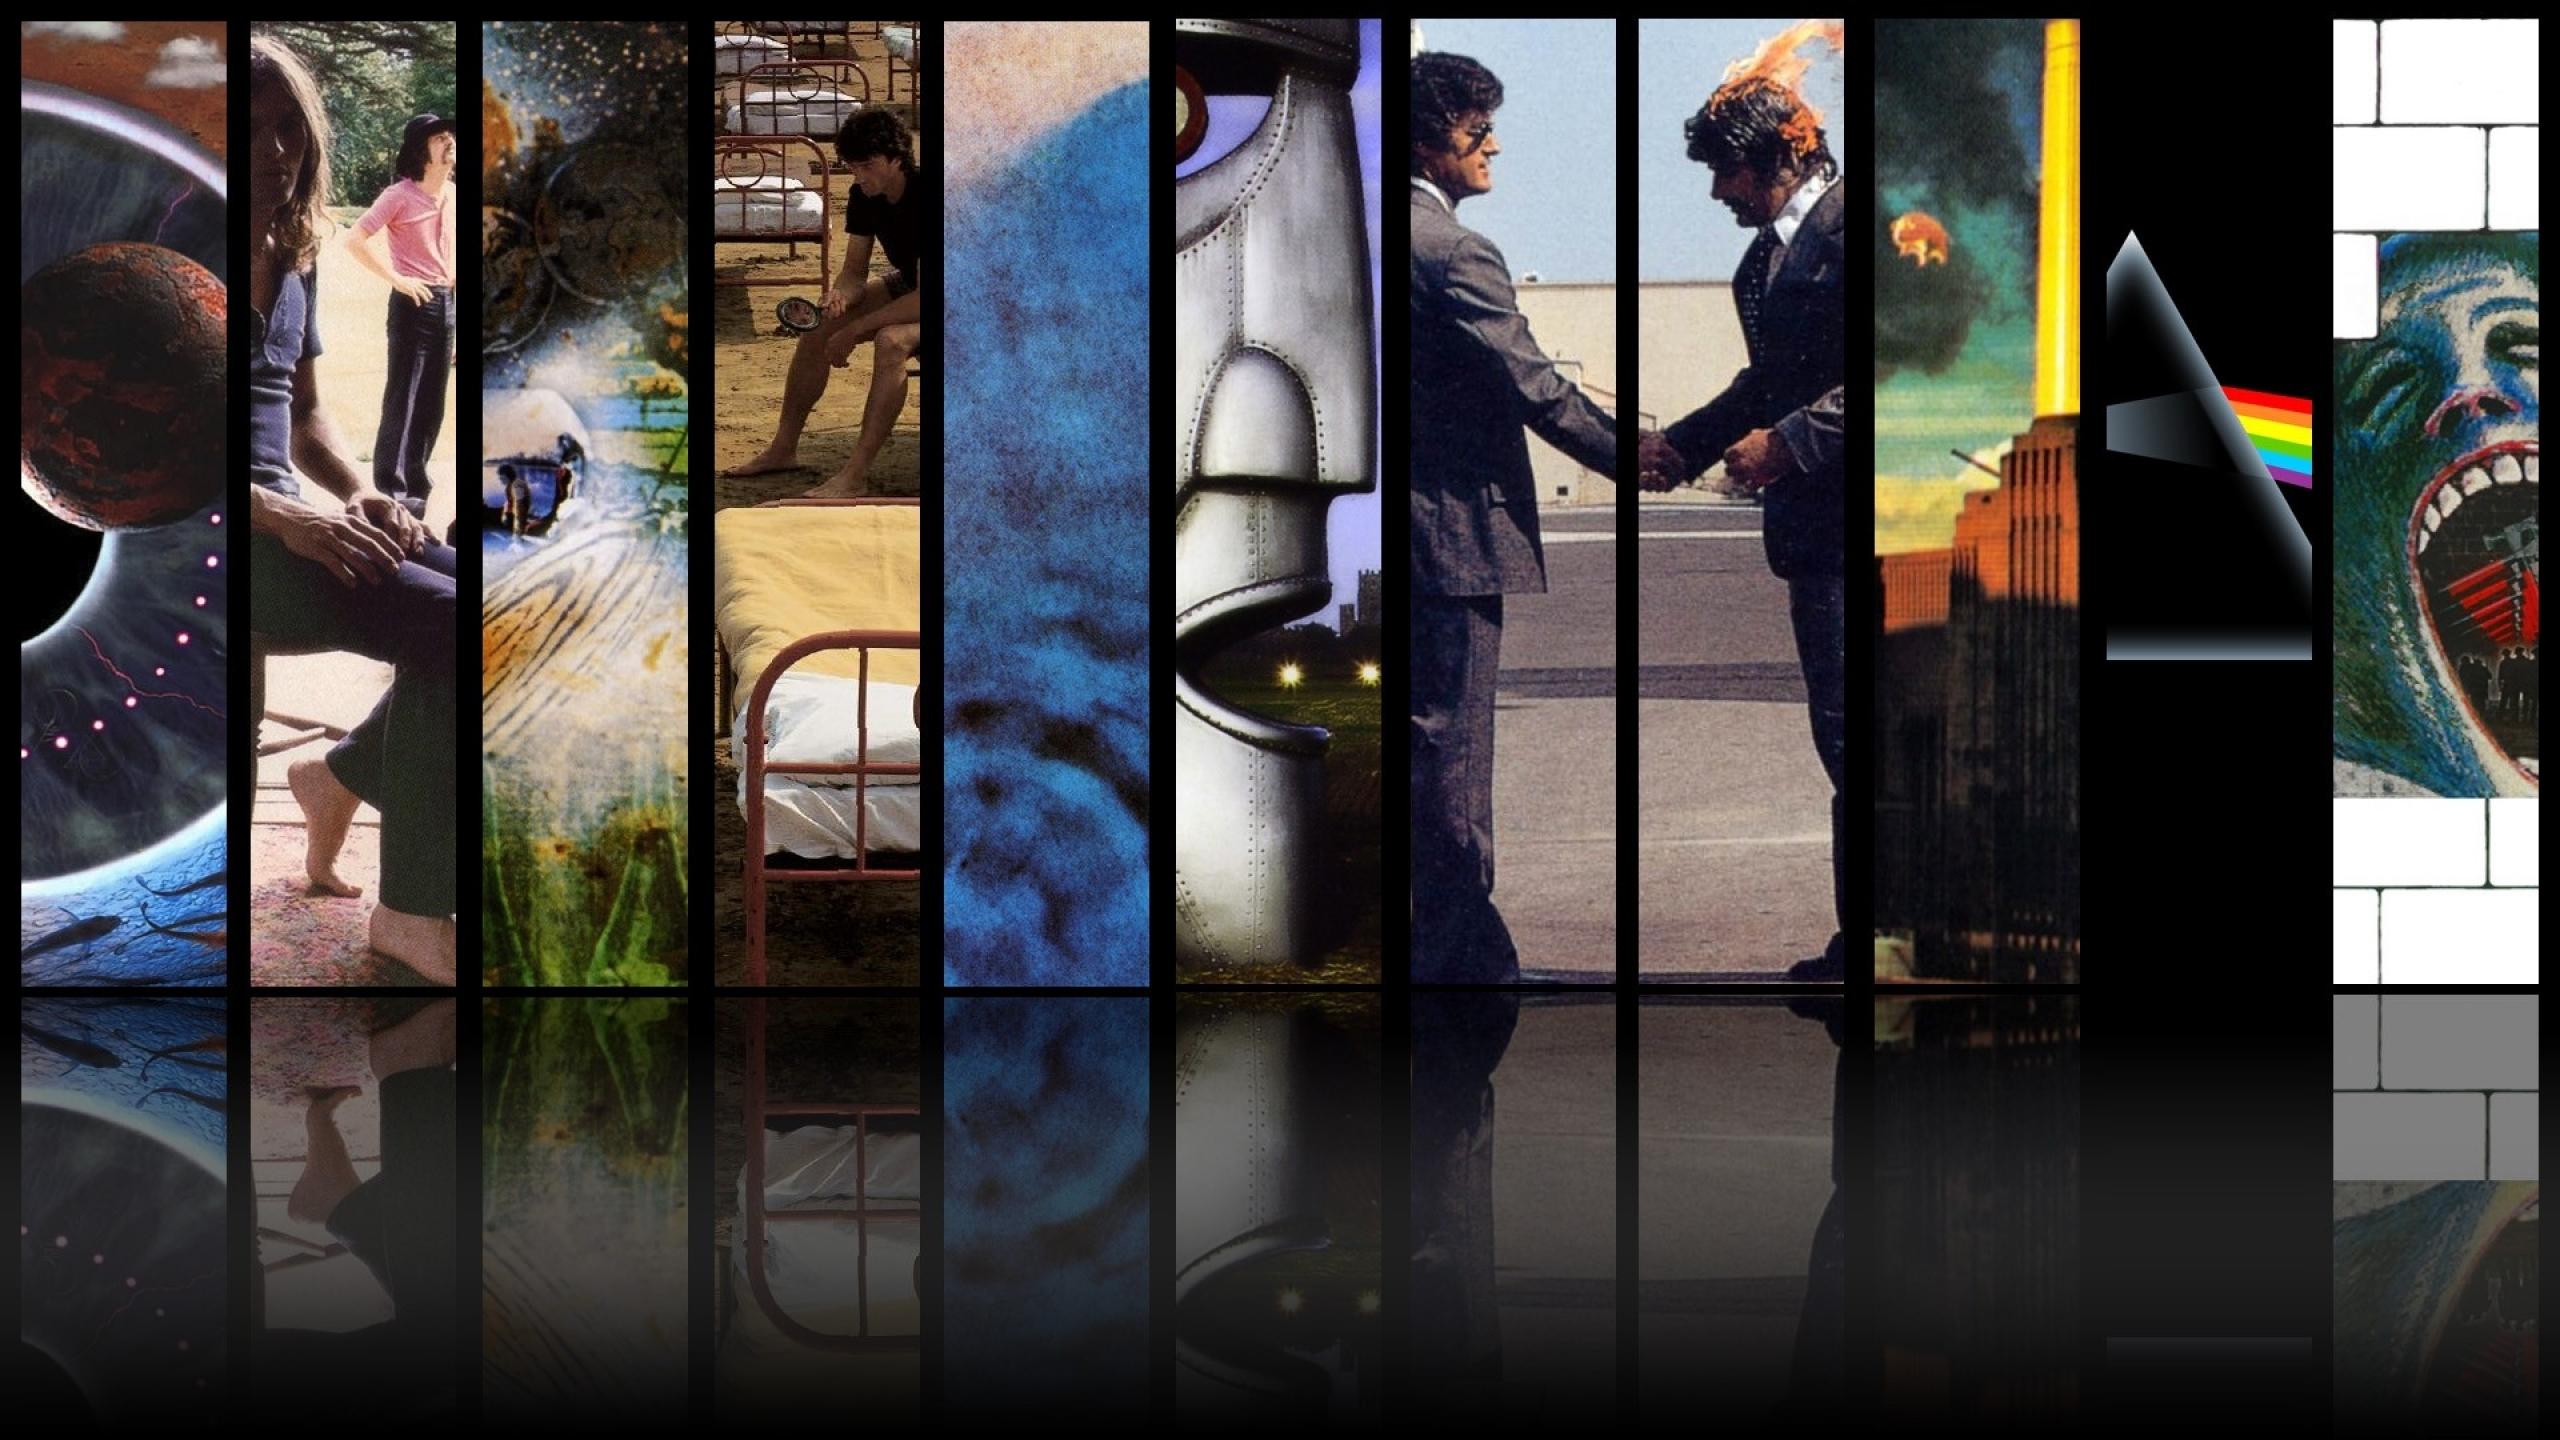 Download Hd Pink Floyd Wallpapers Wallpapercraft 2560x1440 76